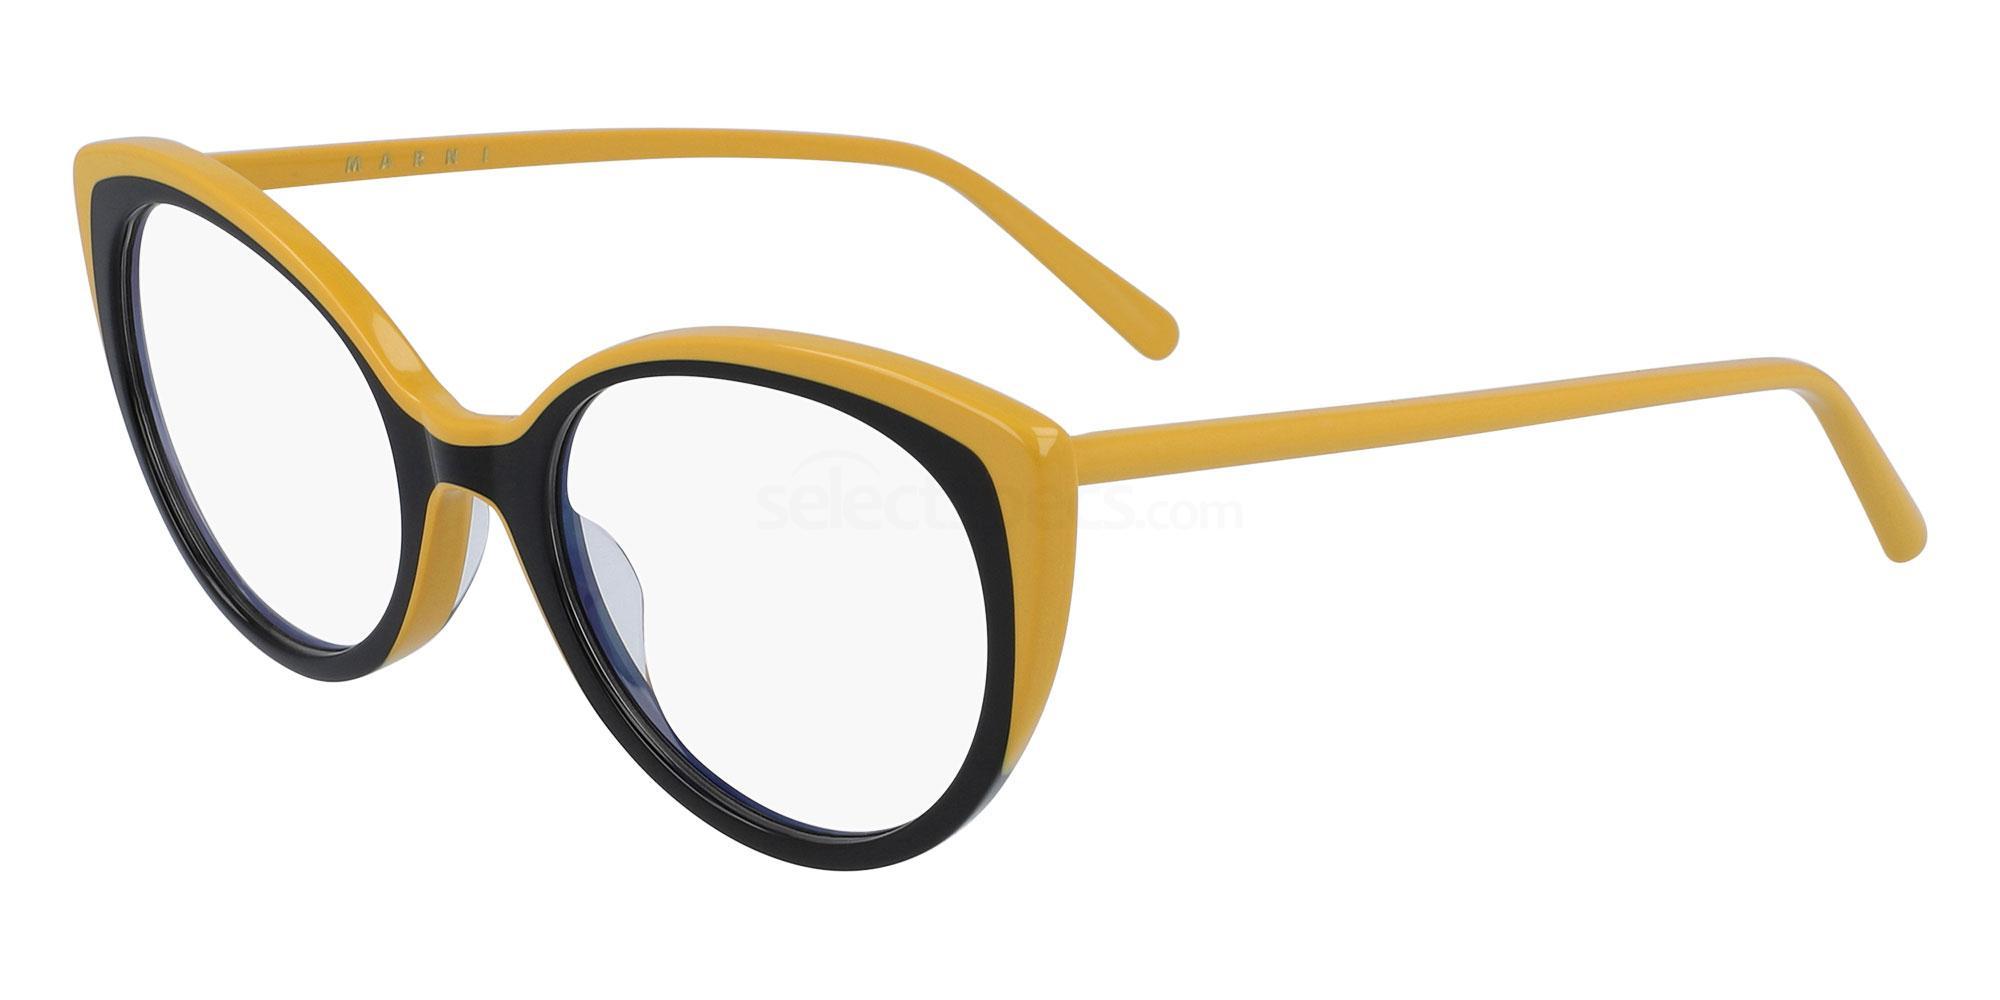 011 ME2625 Glasses, Marni